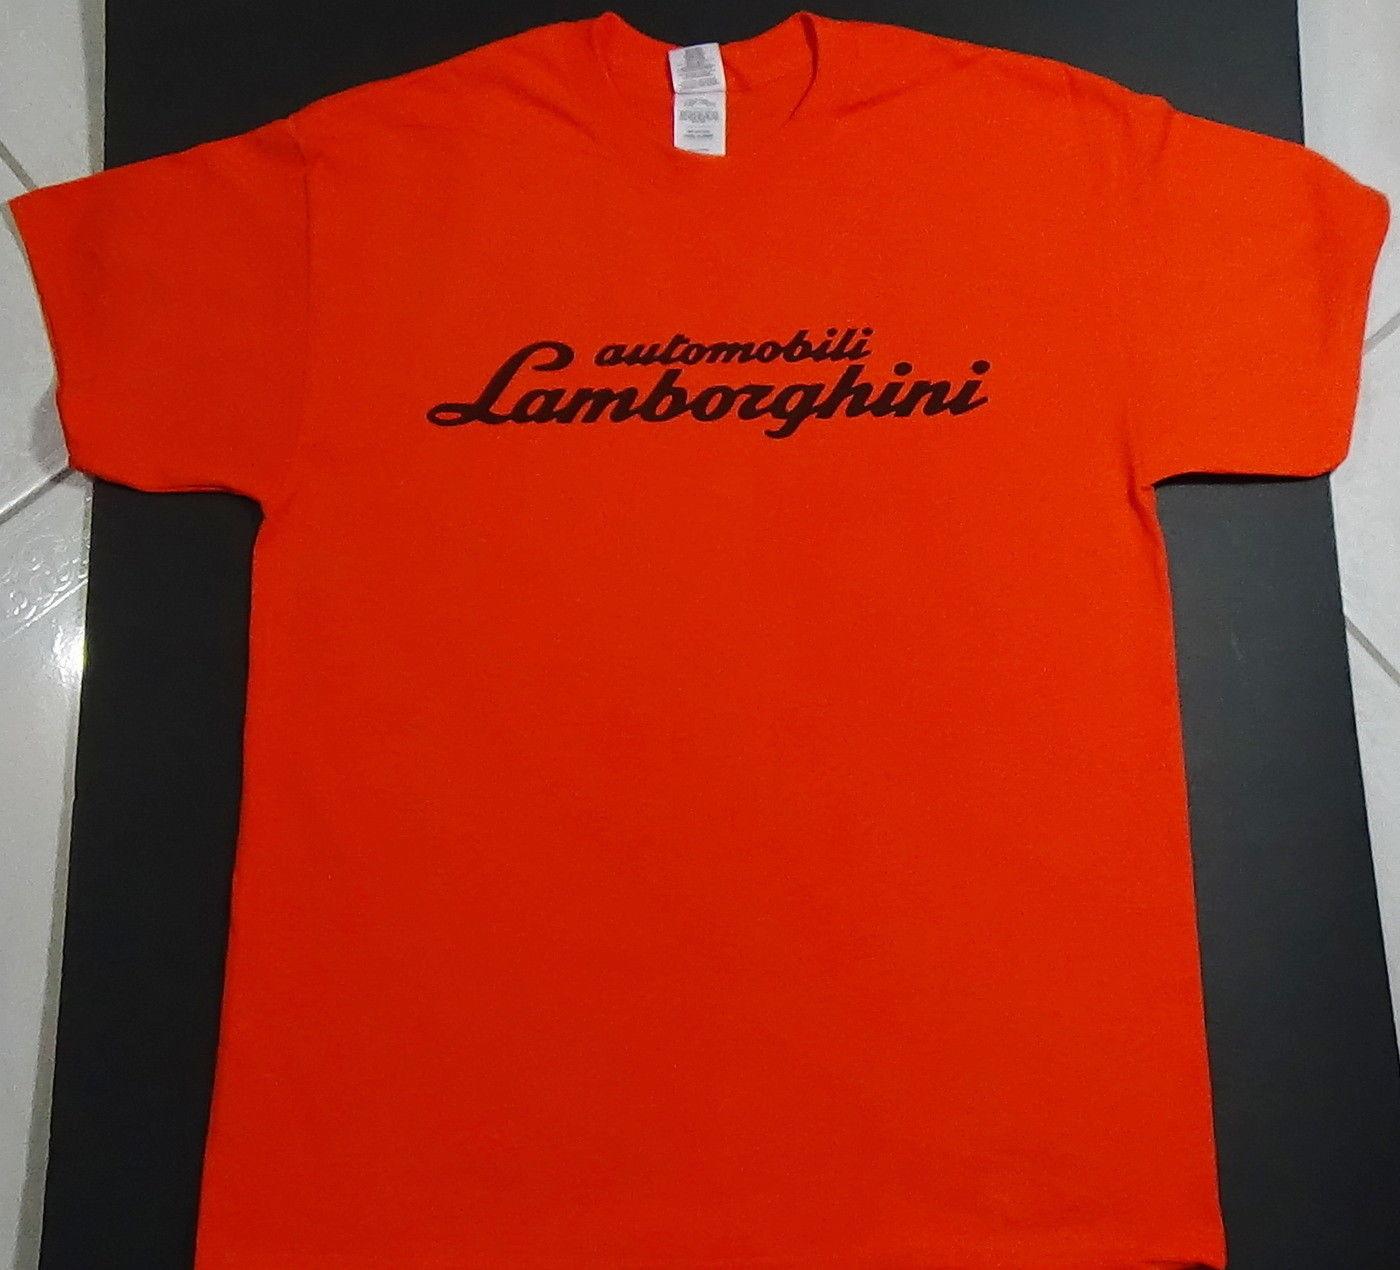 amazing brand new lamborghini t shirt logo badge emblem. Black Bedroom Furniture Sets. Home Design Ideas